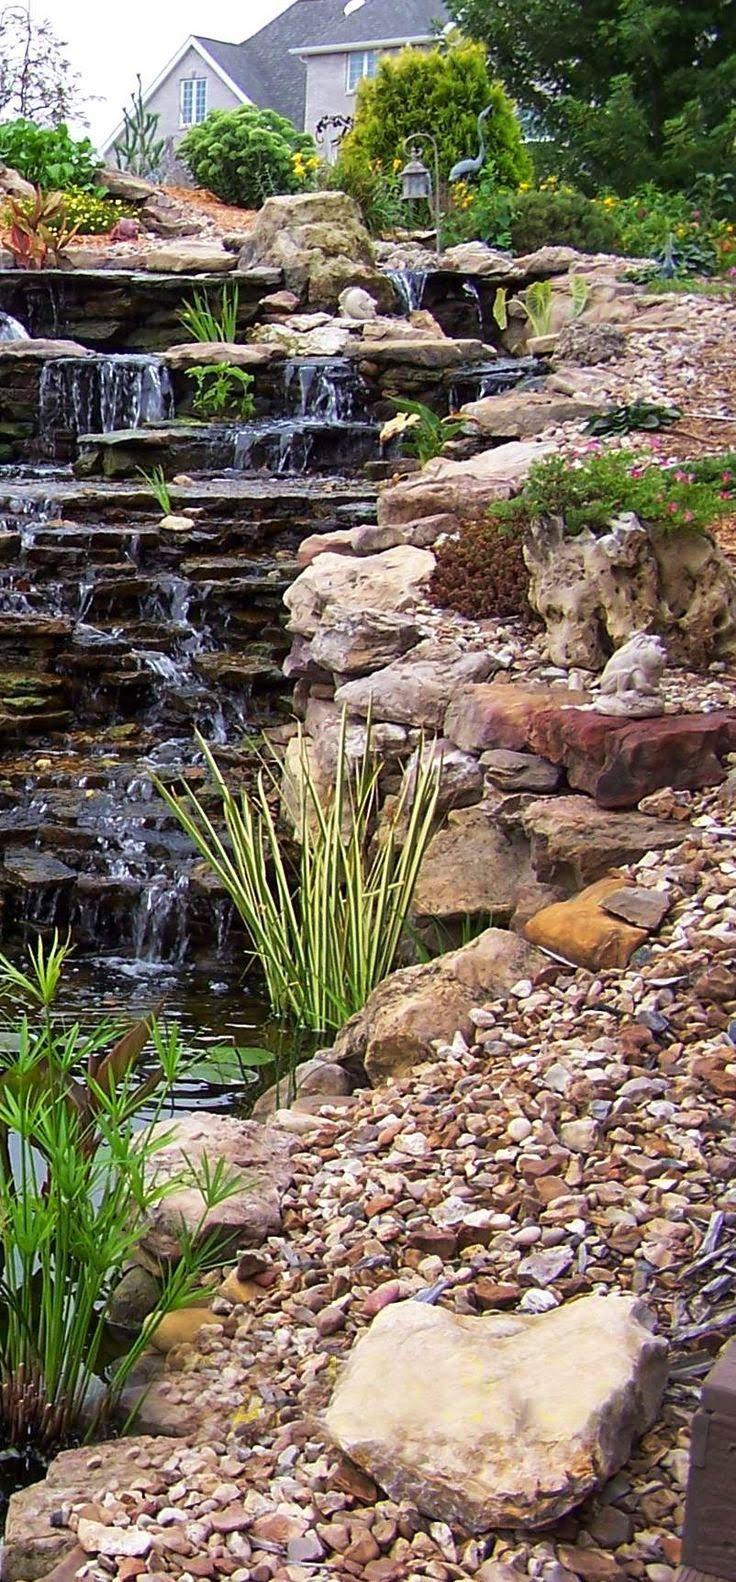 World Best Things Backyard Gardens Waterfalls Backyard Water Features In The Garden Garden Waterfall